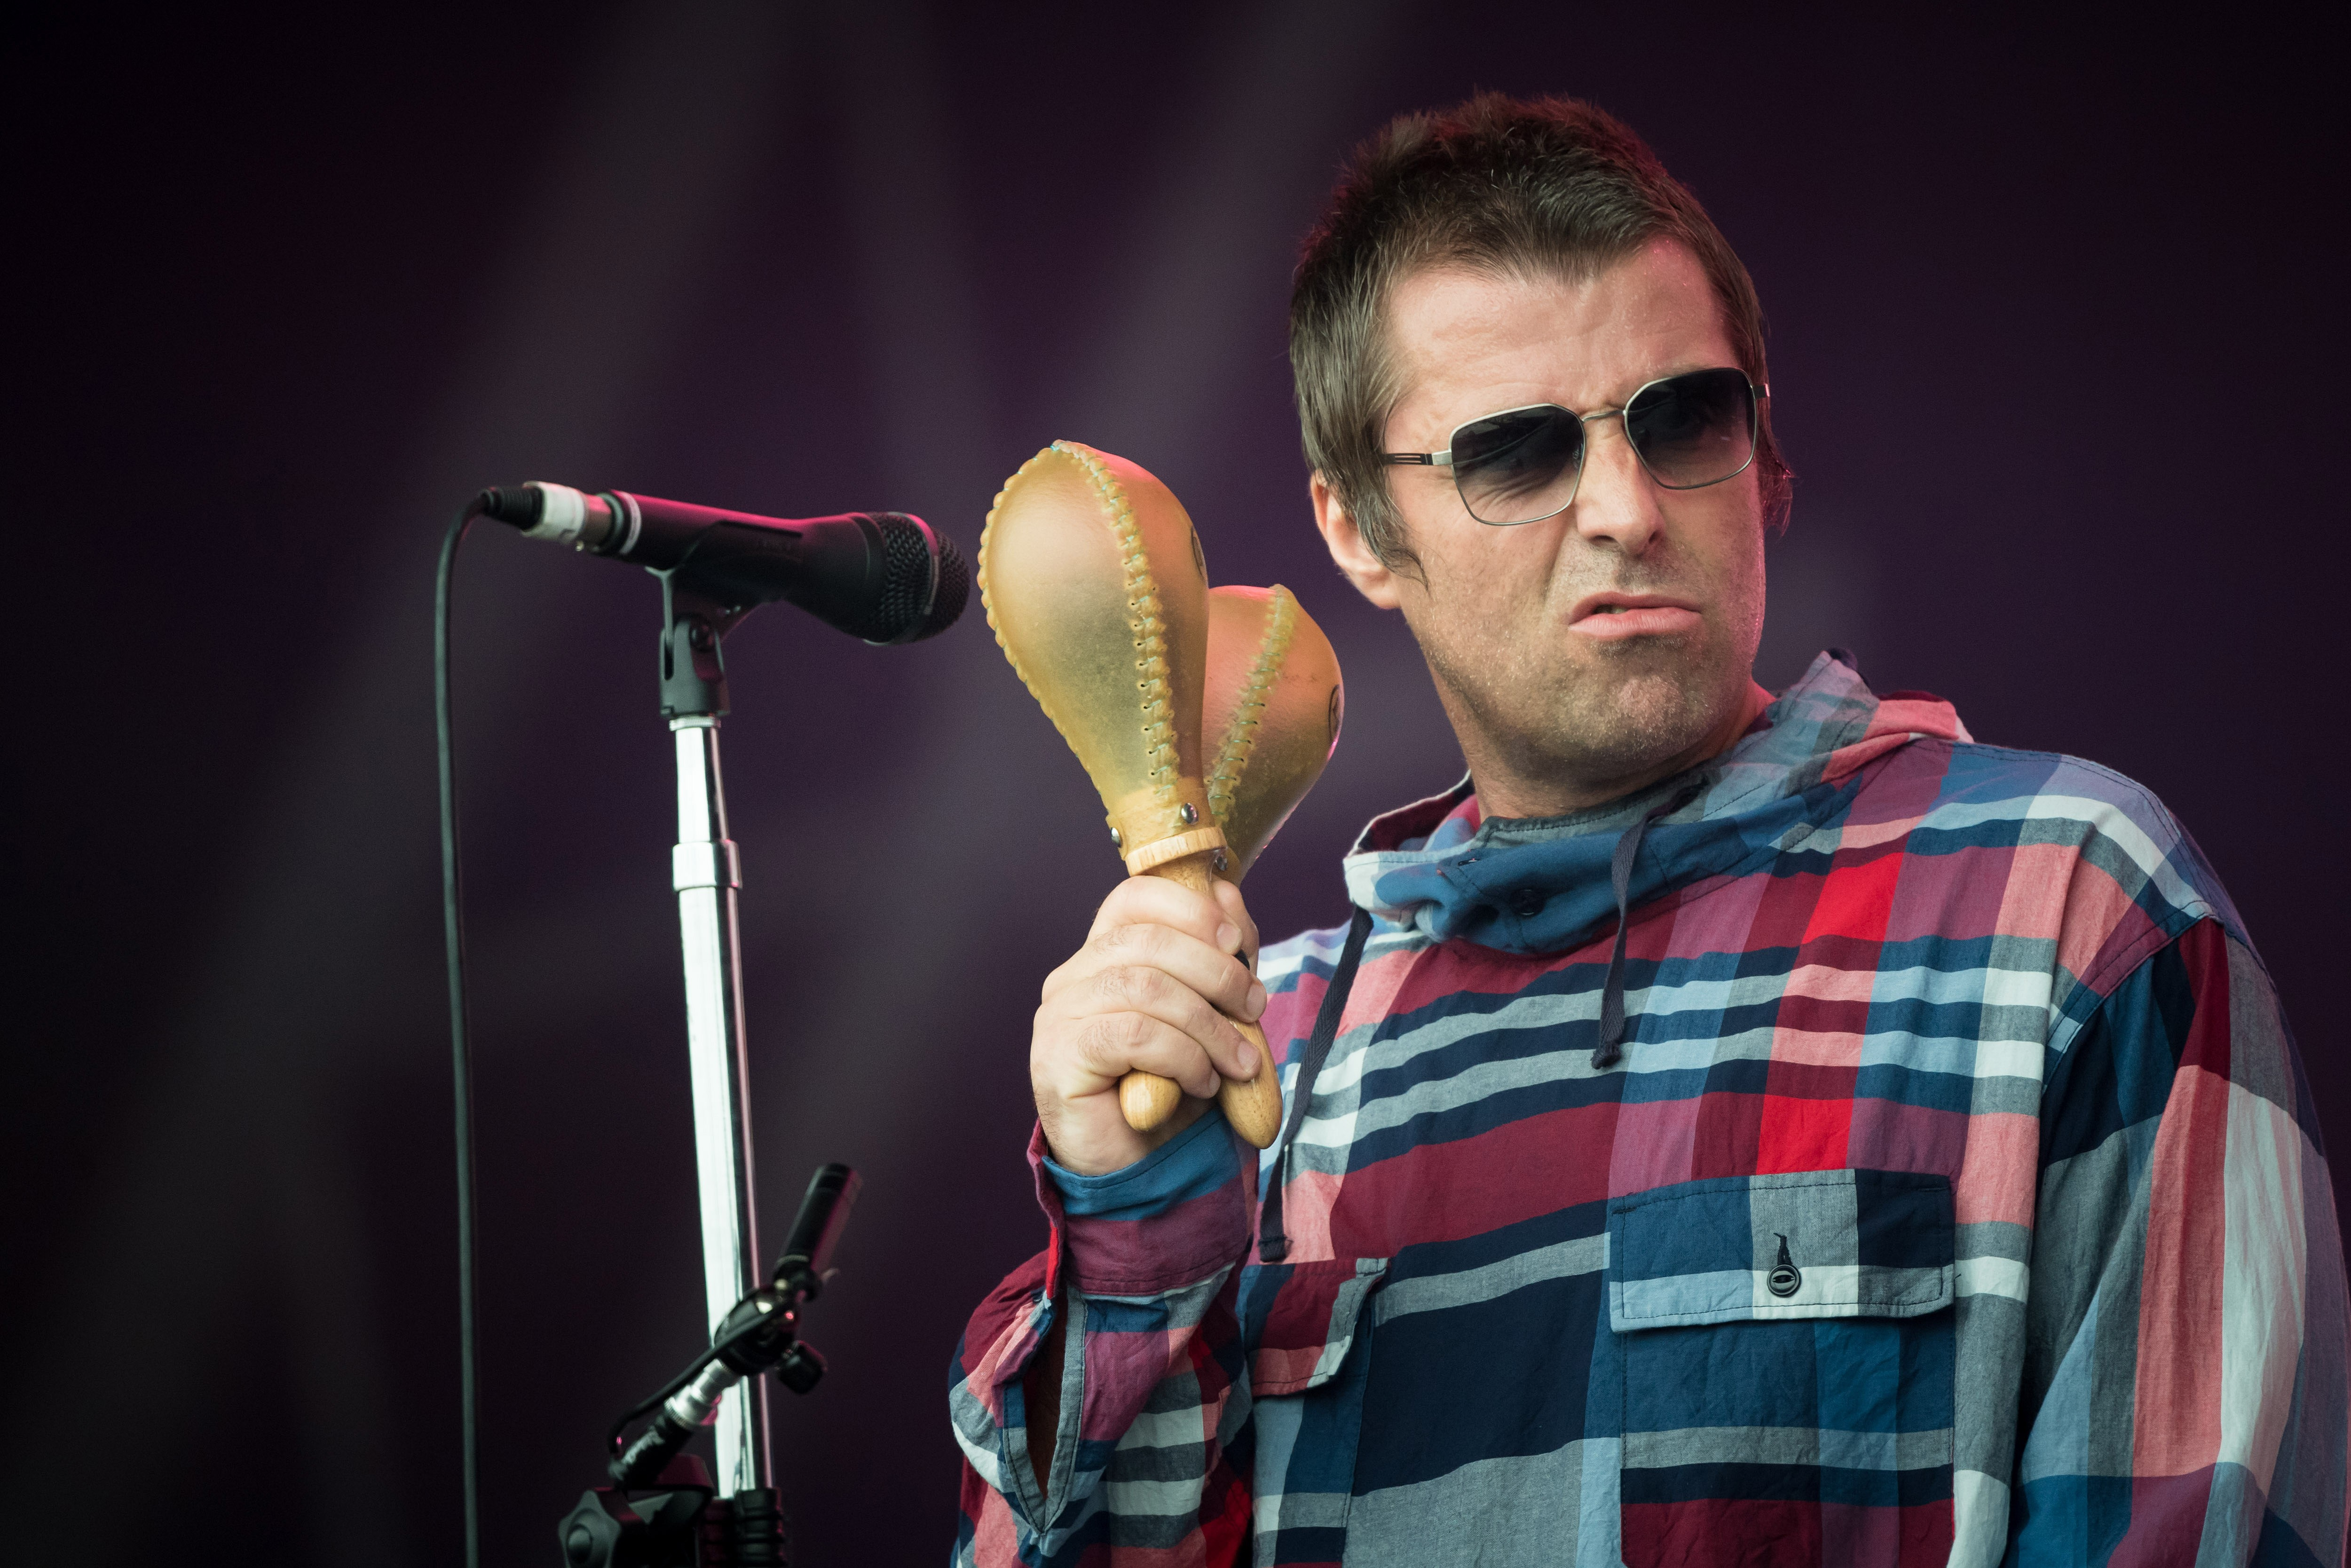 Glastonbury Festival 2019 - Day Four